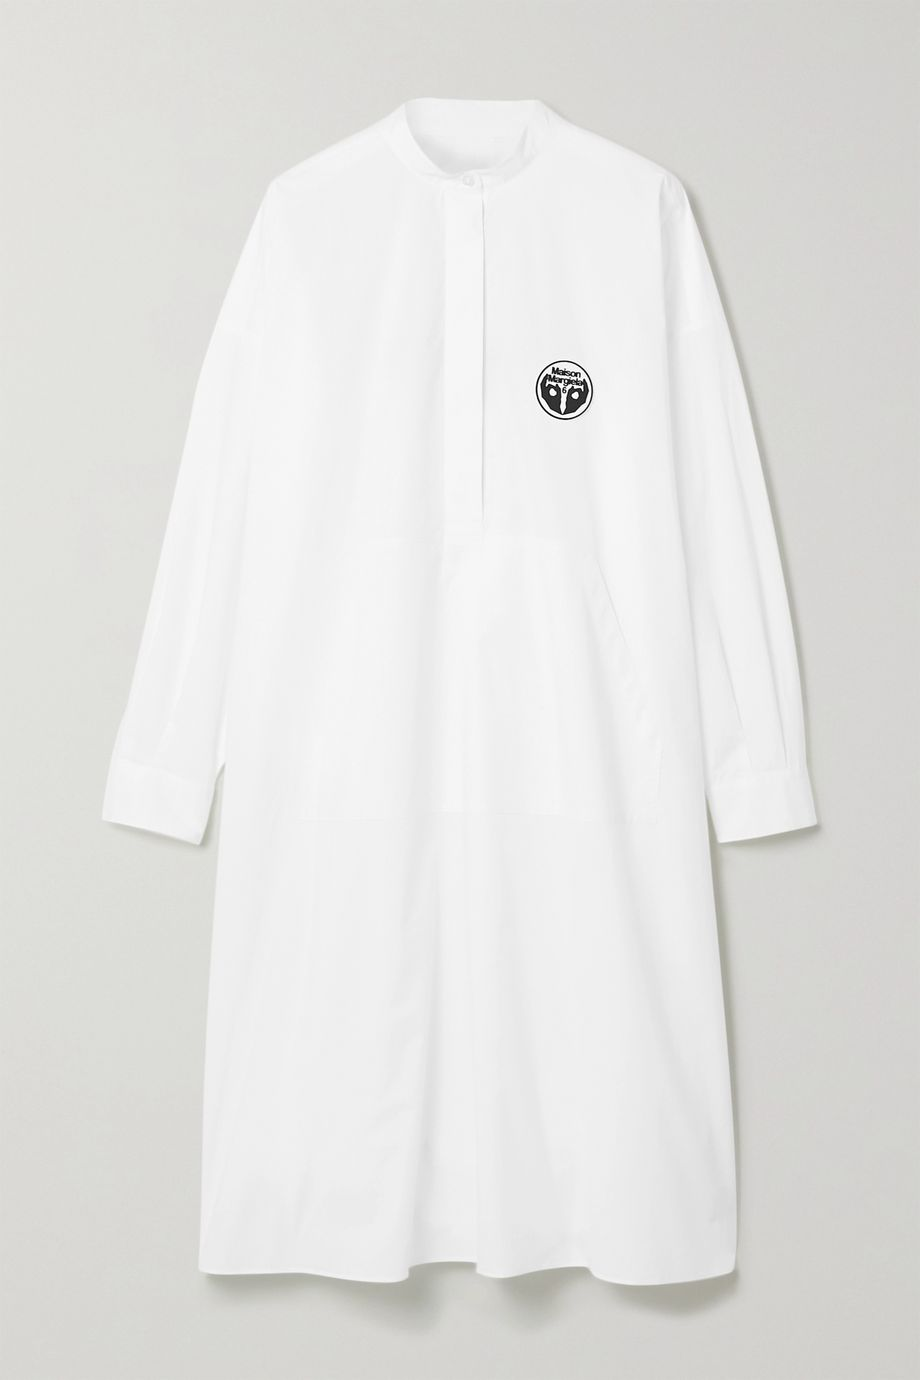 MM6 Maison Margiela Oversized appliquéd printed cotton-poplin dress